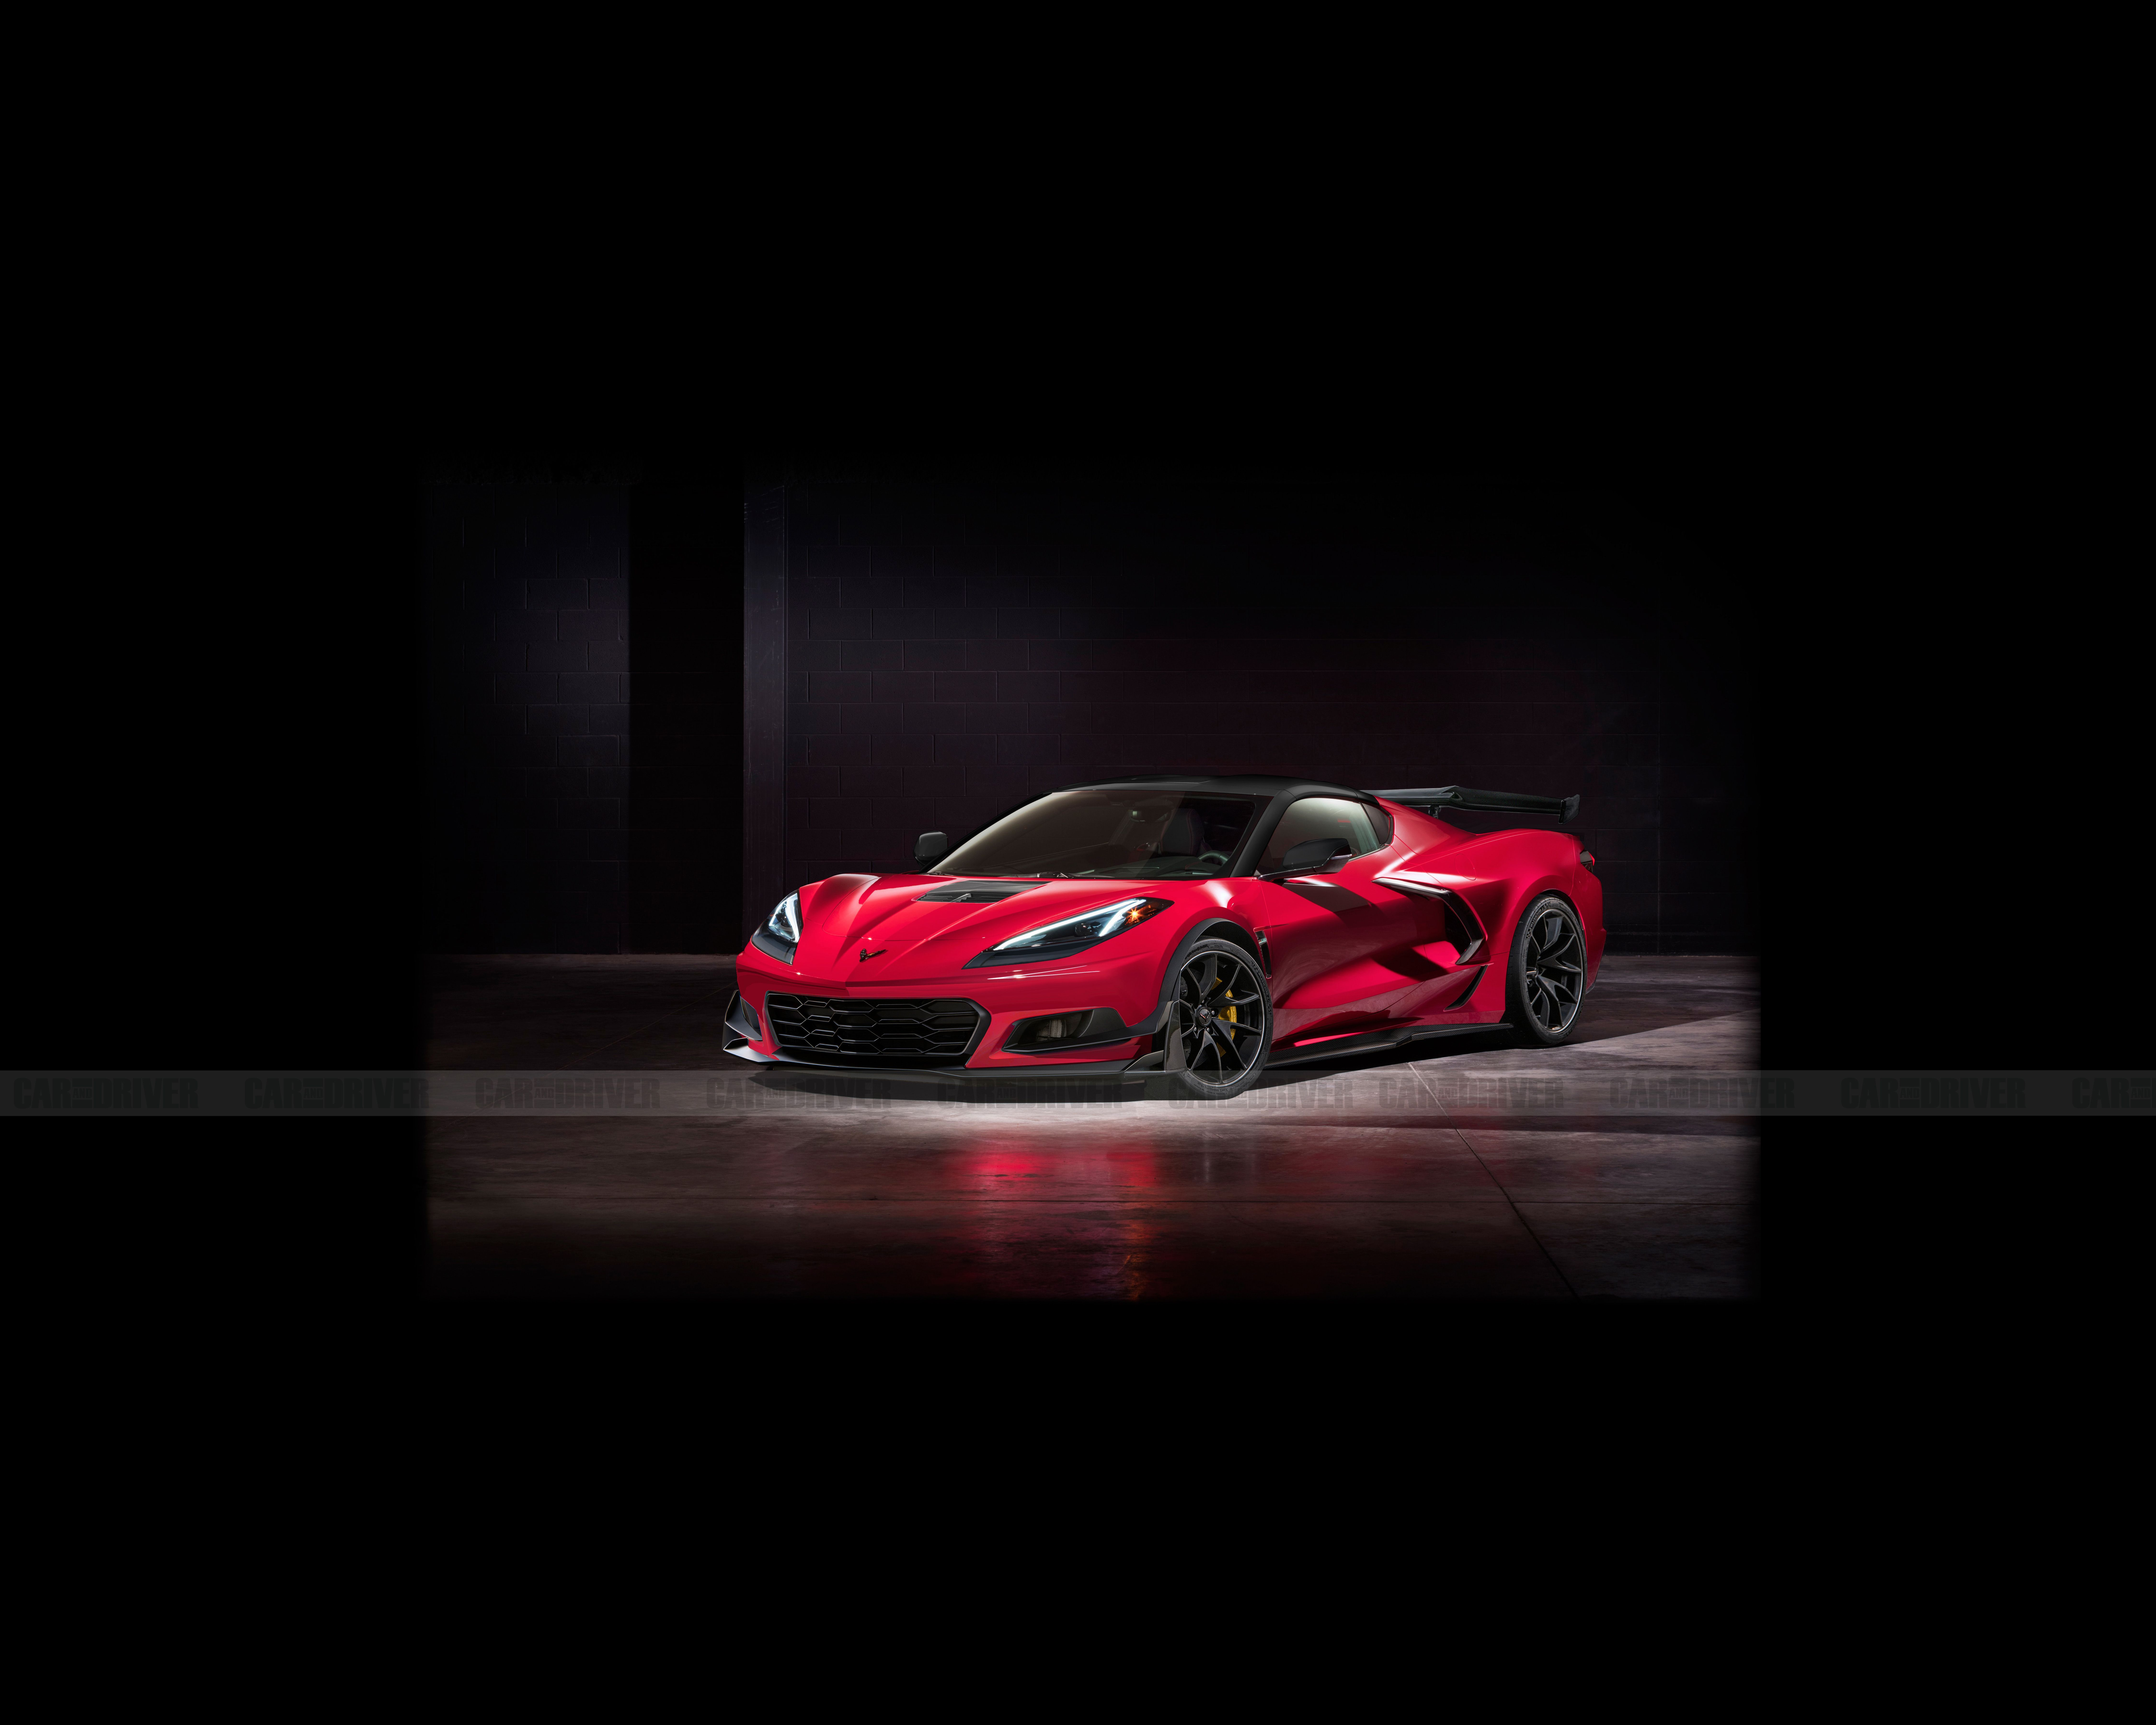 supercars gallery: 2022 chevrolet corvette z06 zr1